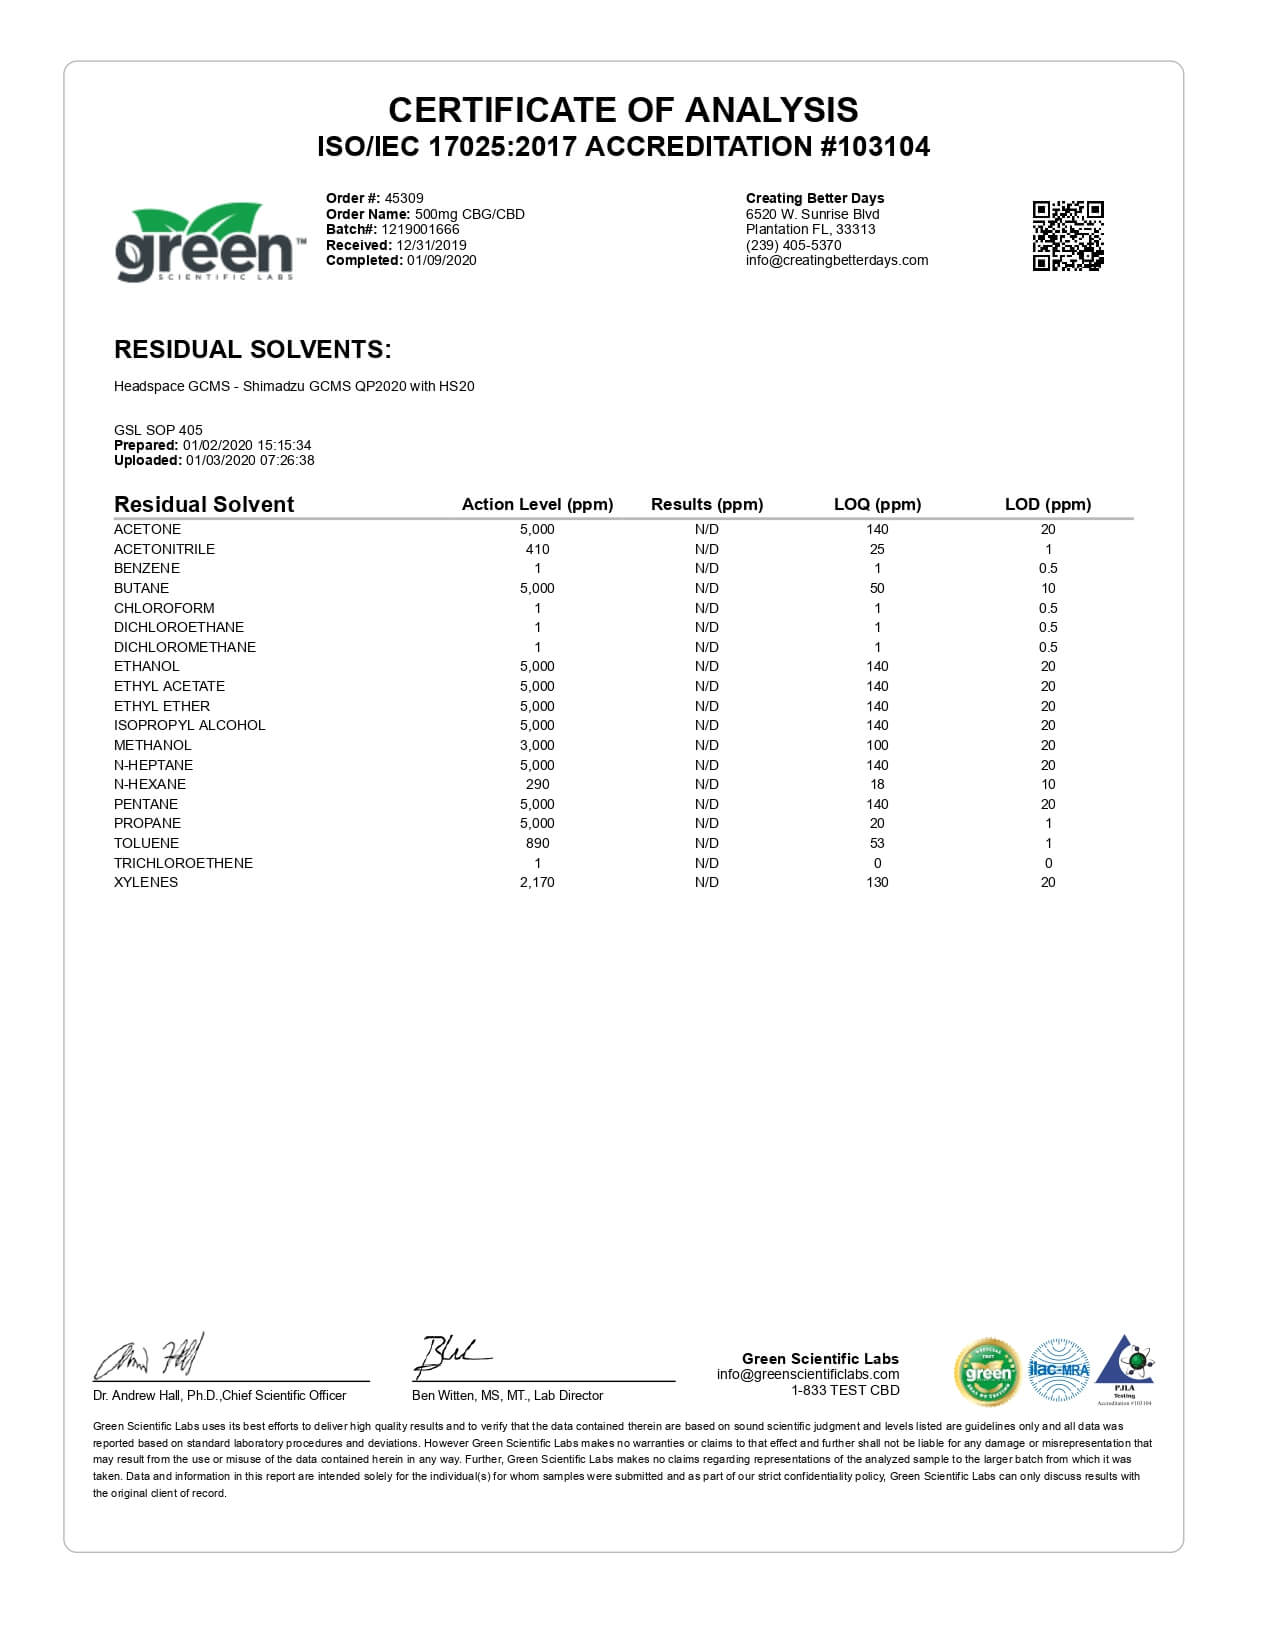 Creating Better Days CBD Tincture 1:1 Ratio CBD+CBG 500mg Lab Report